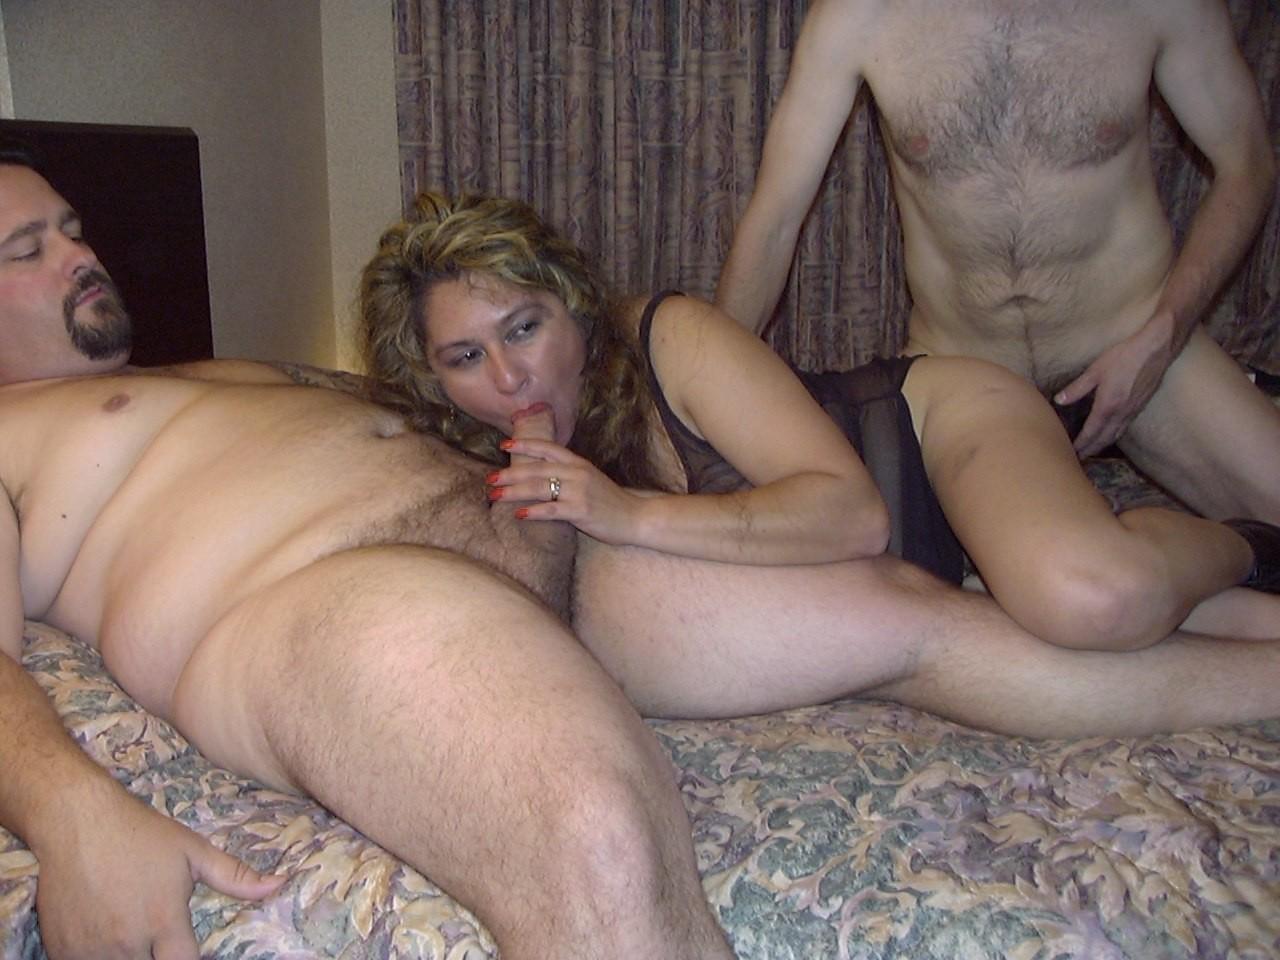 seks-s-russkimi-zamuzhnimi-zhenshinami-video-video-russkiy